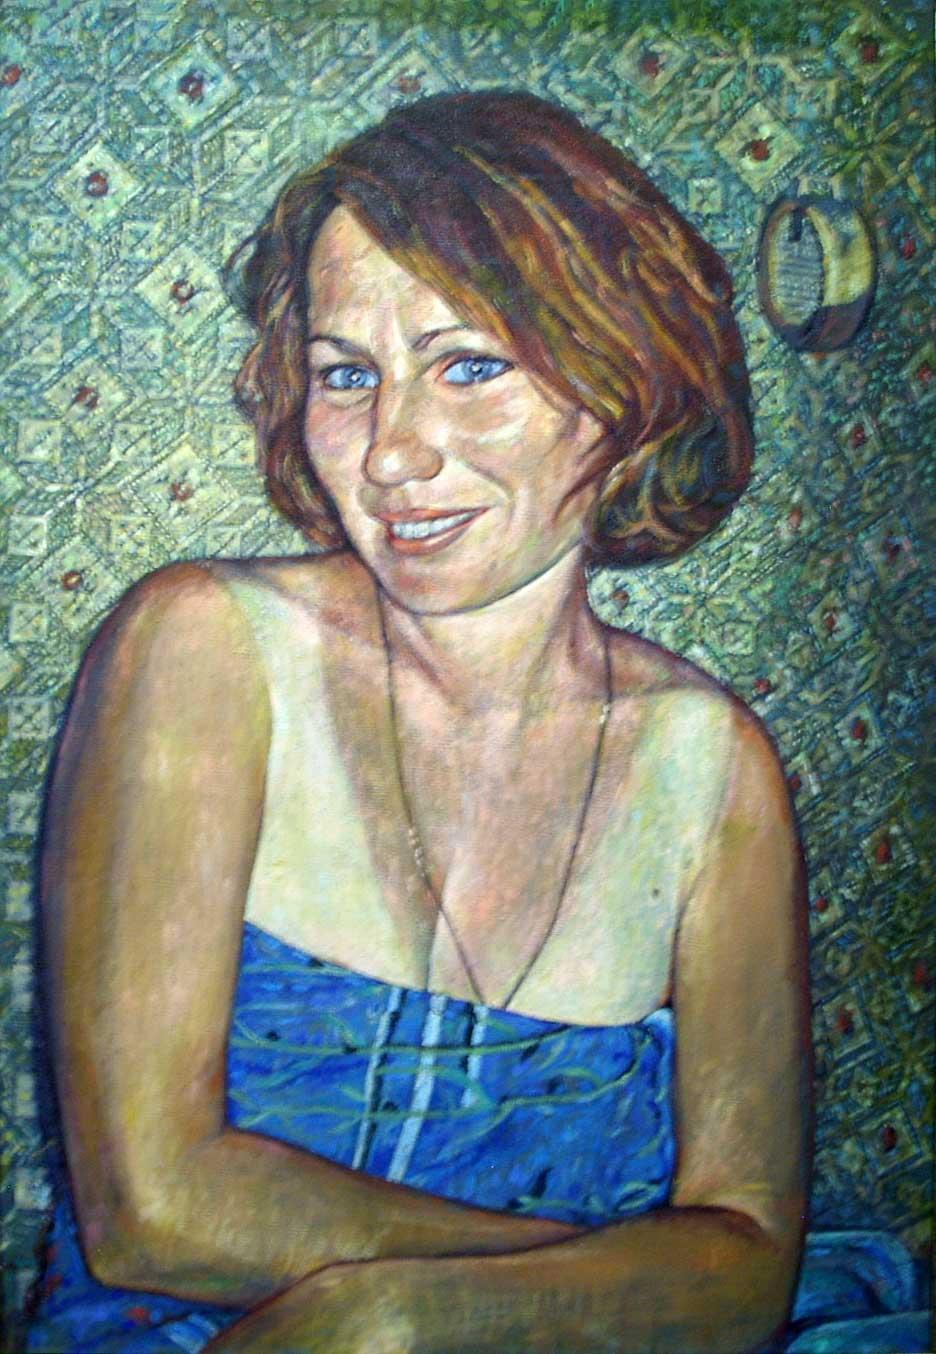 Наташа в голубом полотенце